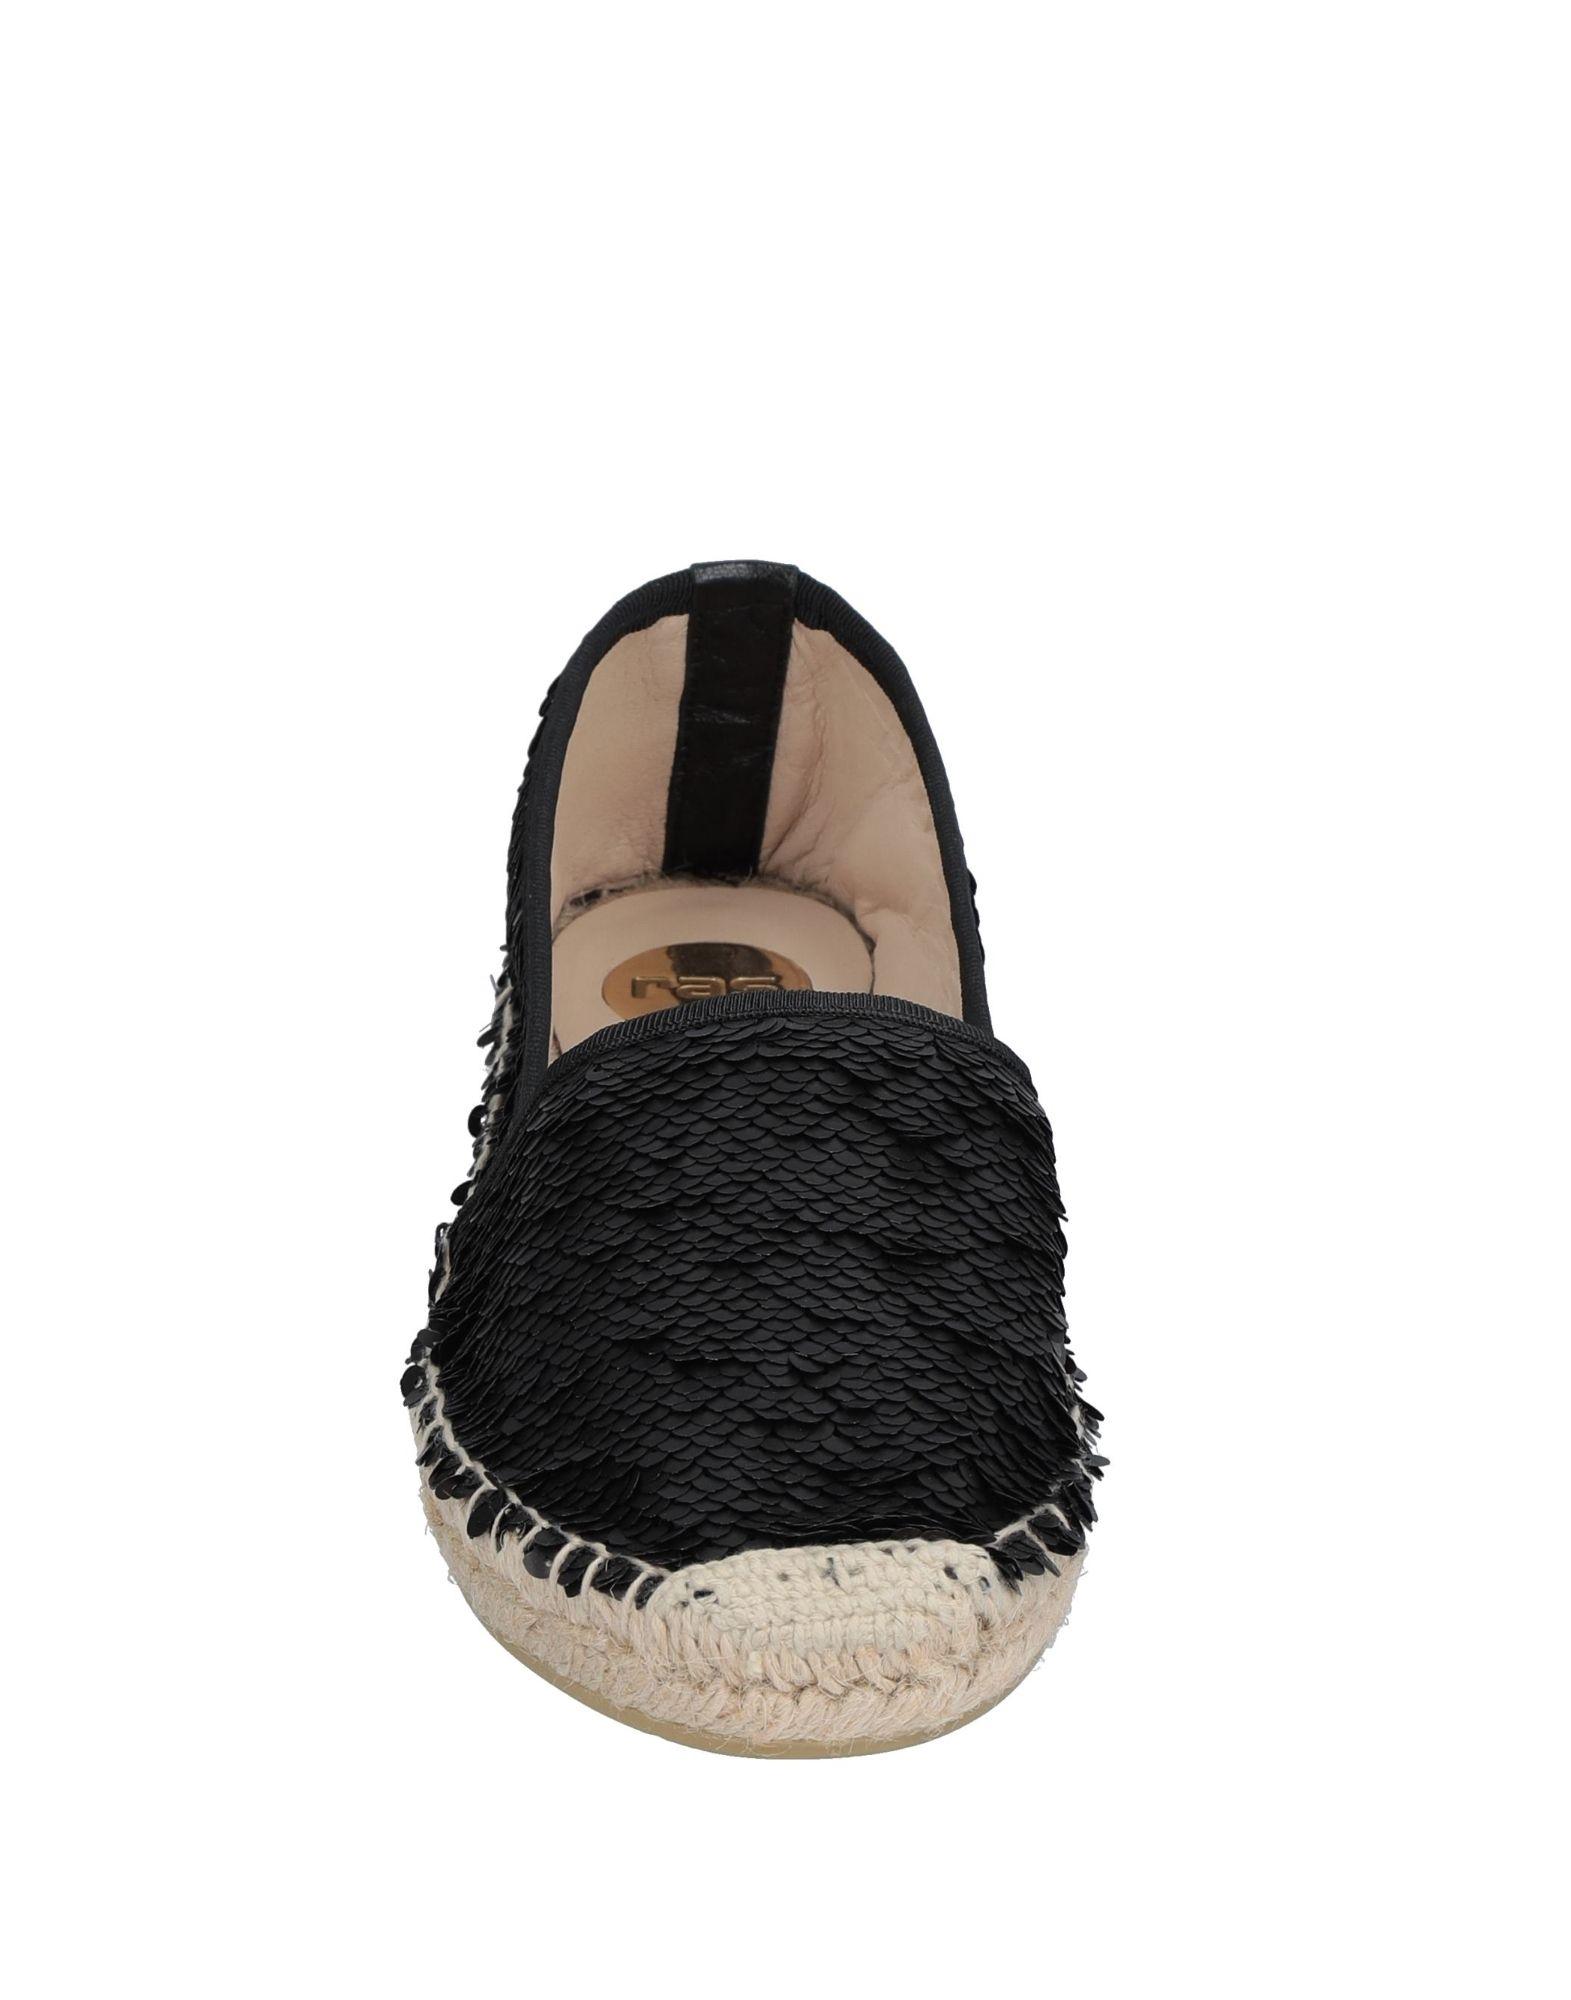 Ras Espadrilles Damen  11147788TU Gute Gute Gute Qualität beliebte Schuhe cd6dc7